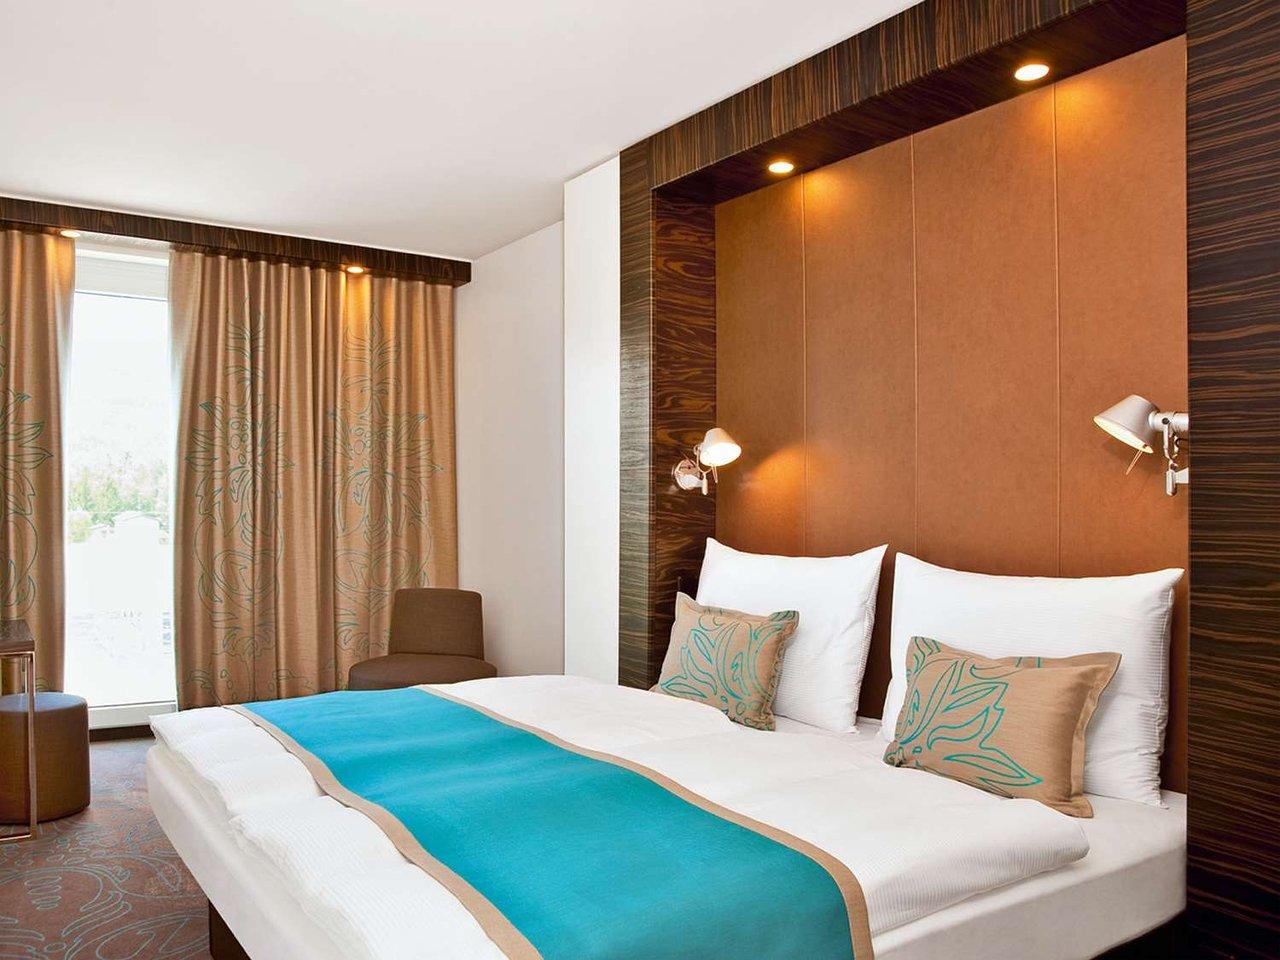 Bremen Motel One motel one bremen (germany) - hotel reviews, photos & price